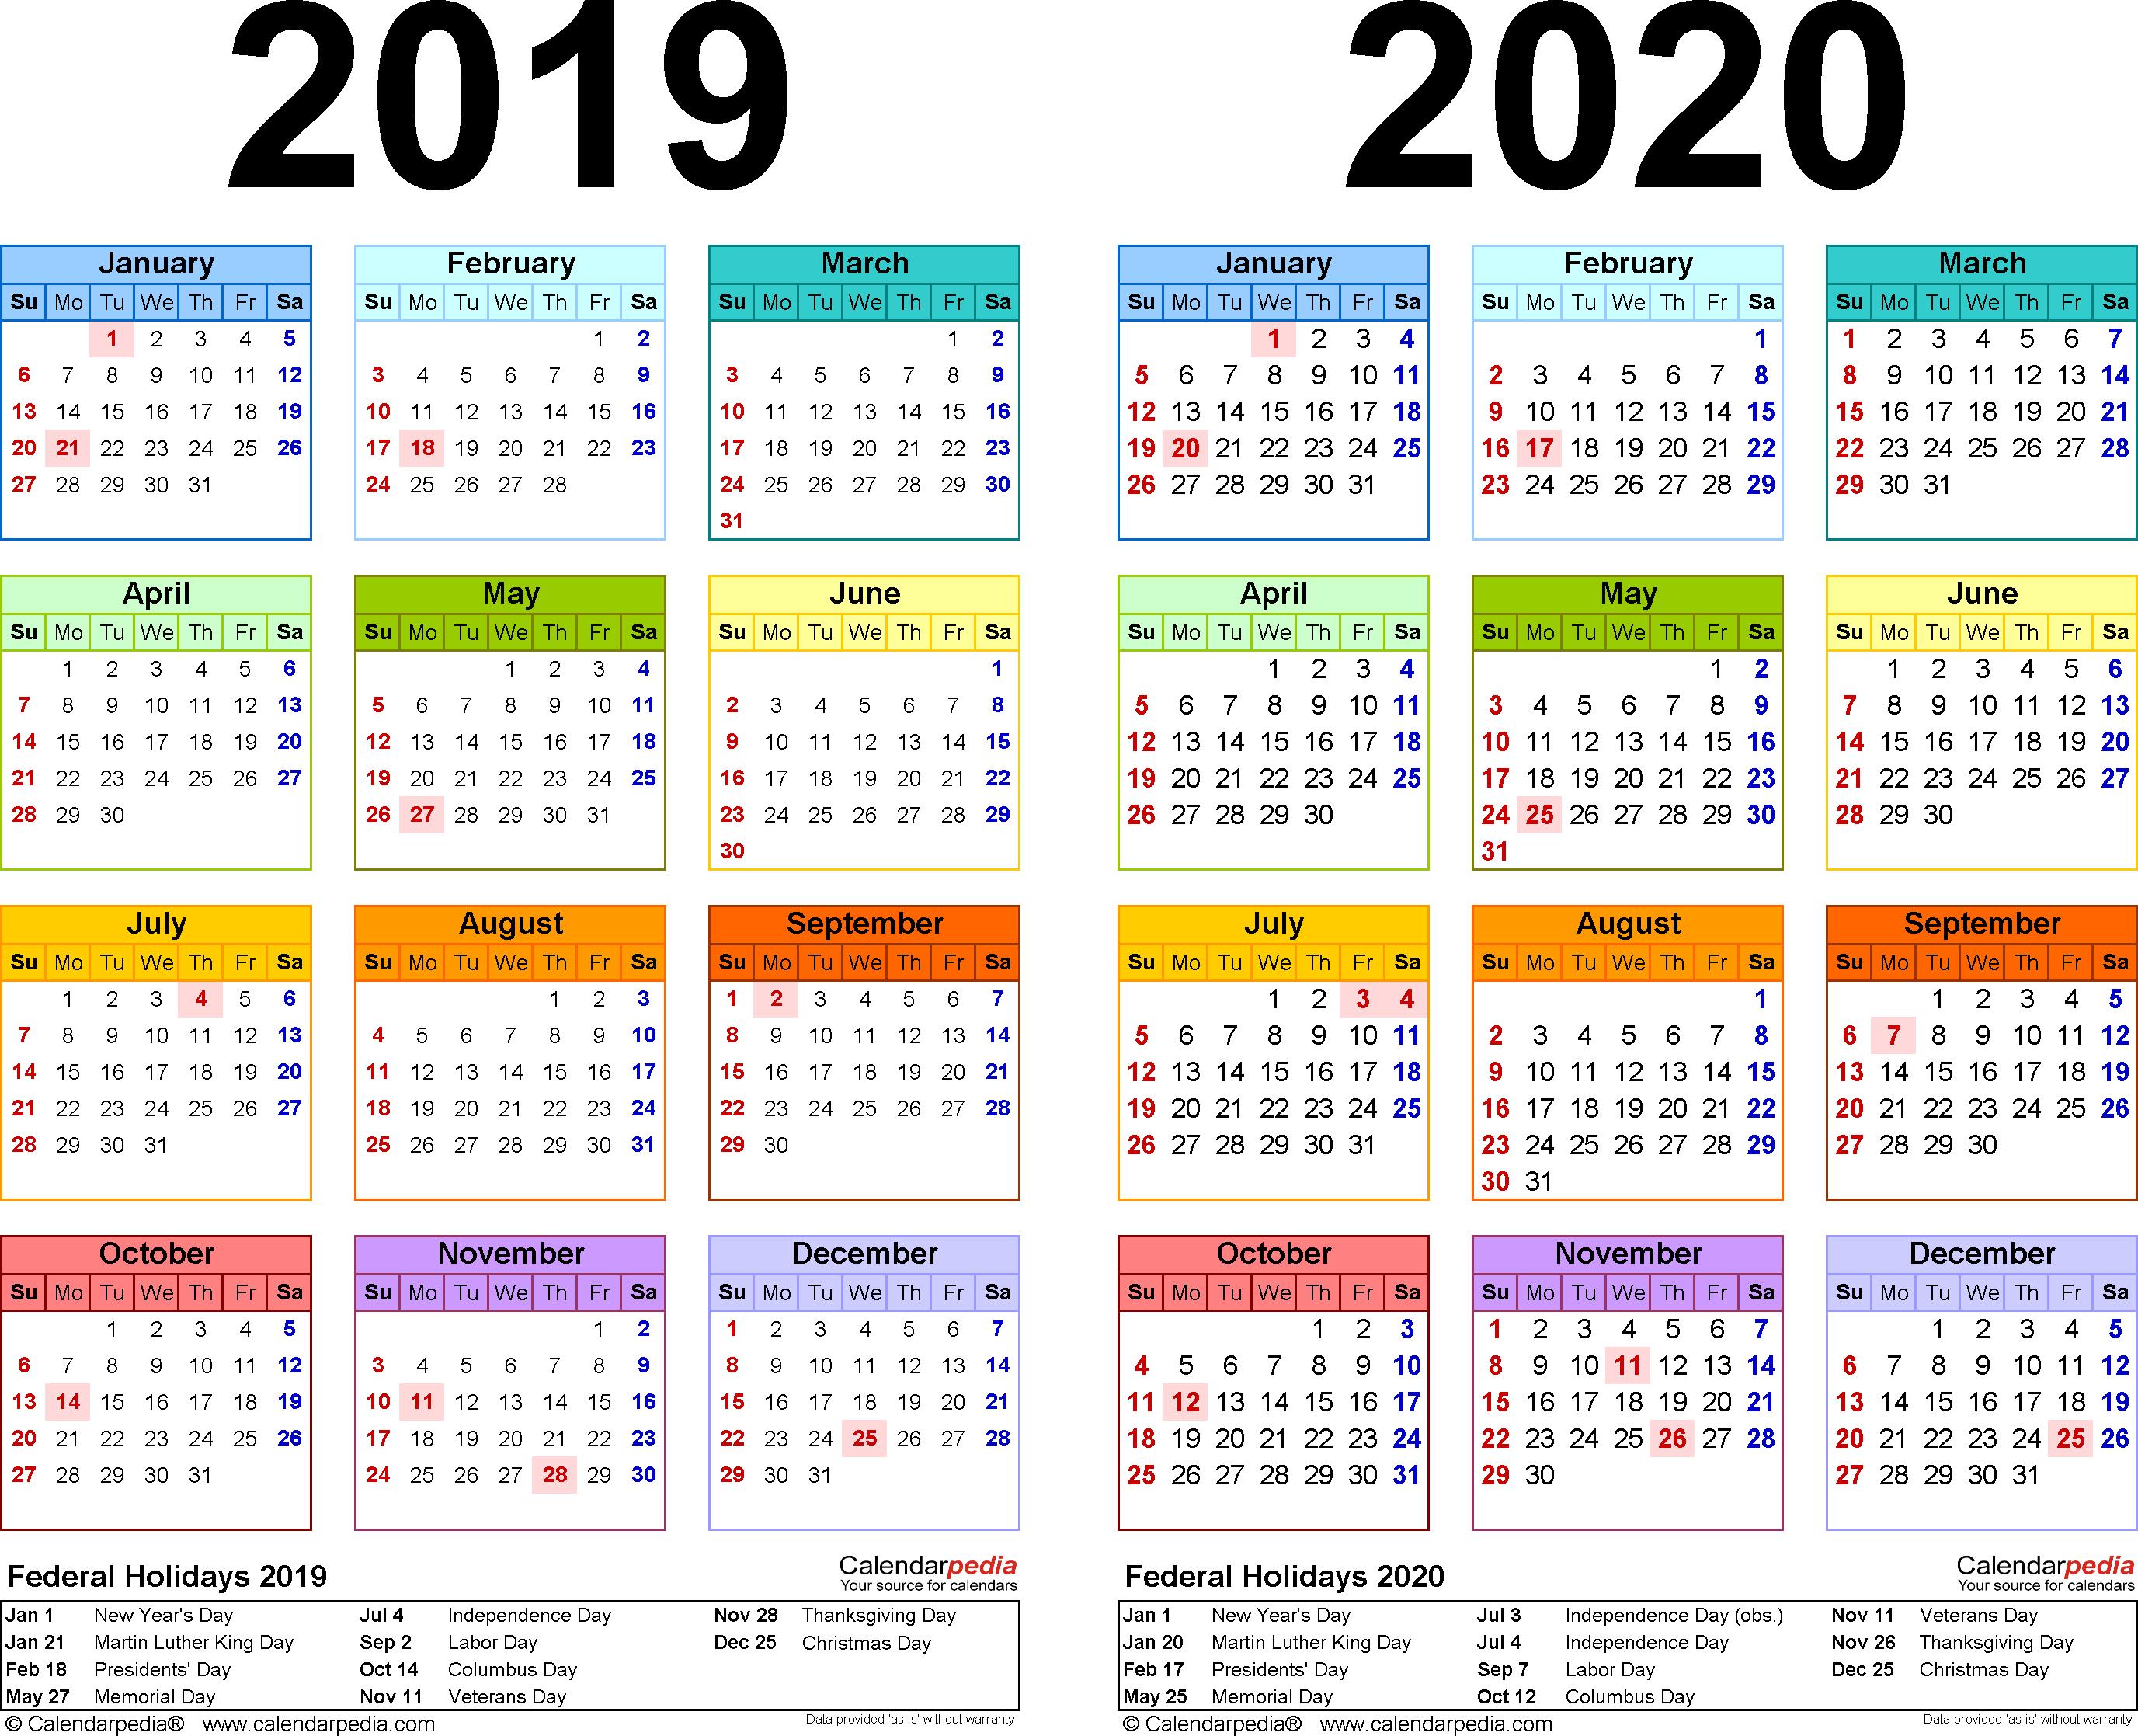 2019-2020 Calendar - Free Printable Two-Year Pdf Calendars inside Calendar 2019 2020 Free Download